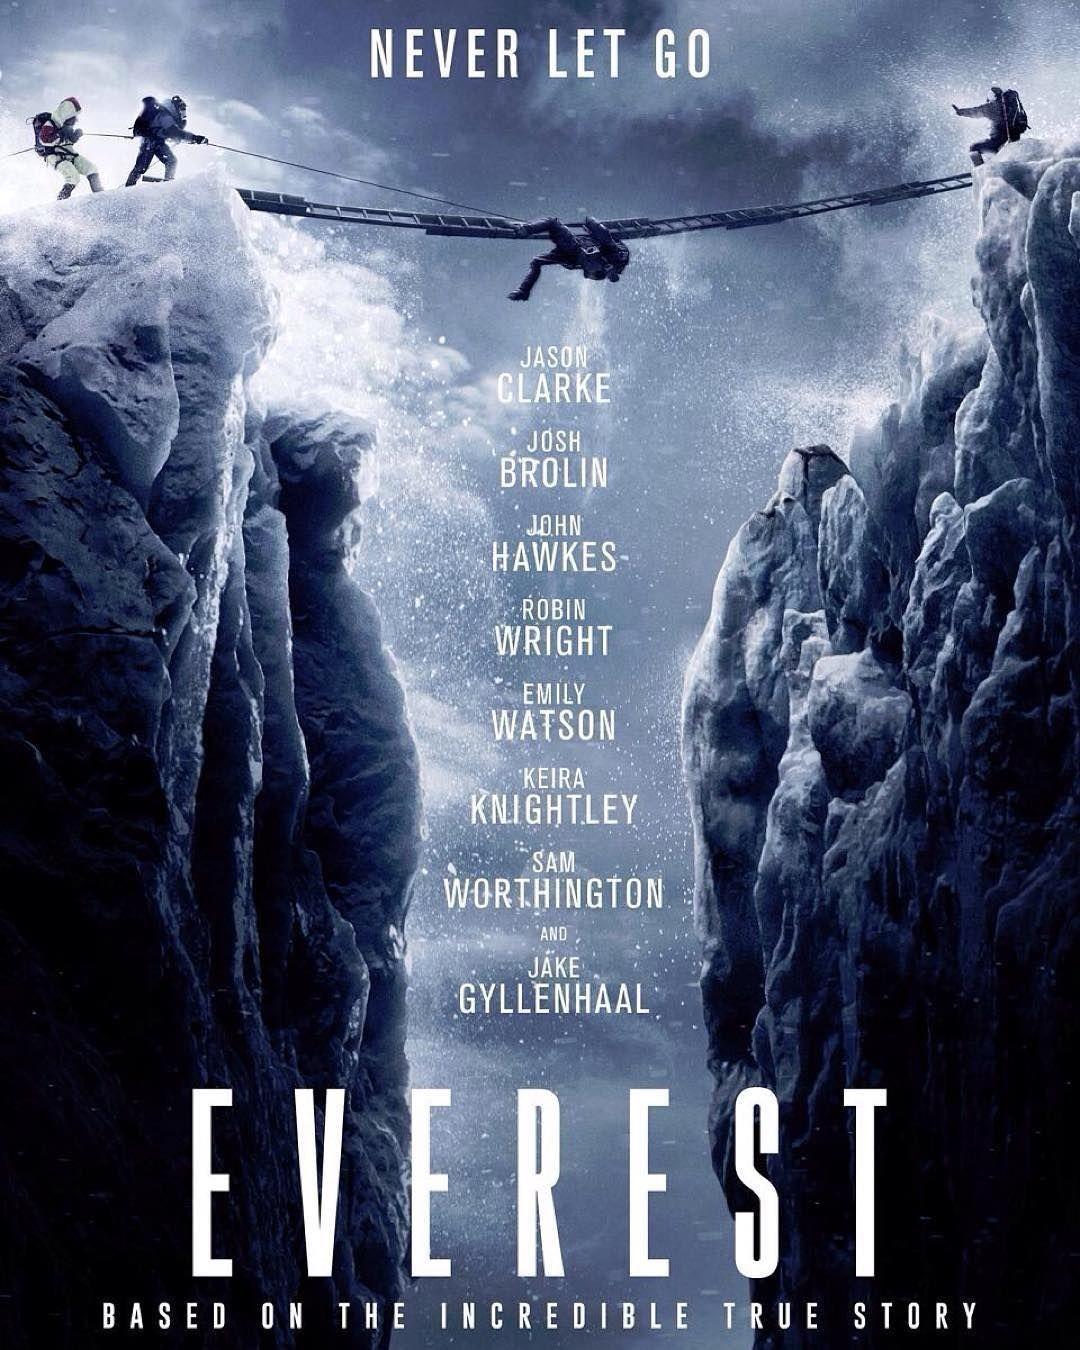 Everest Movie Poster Filmes Shows